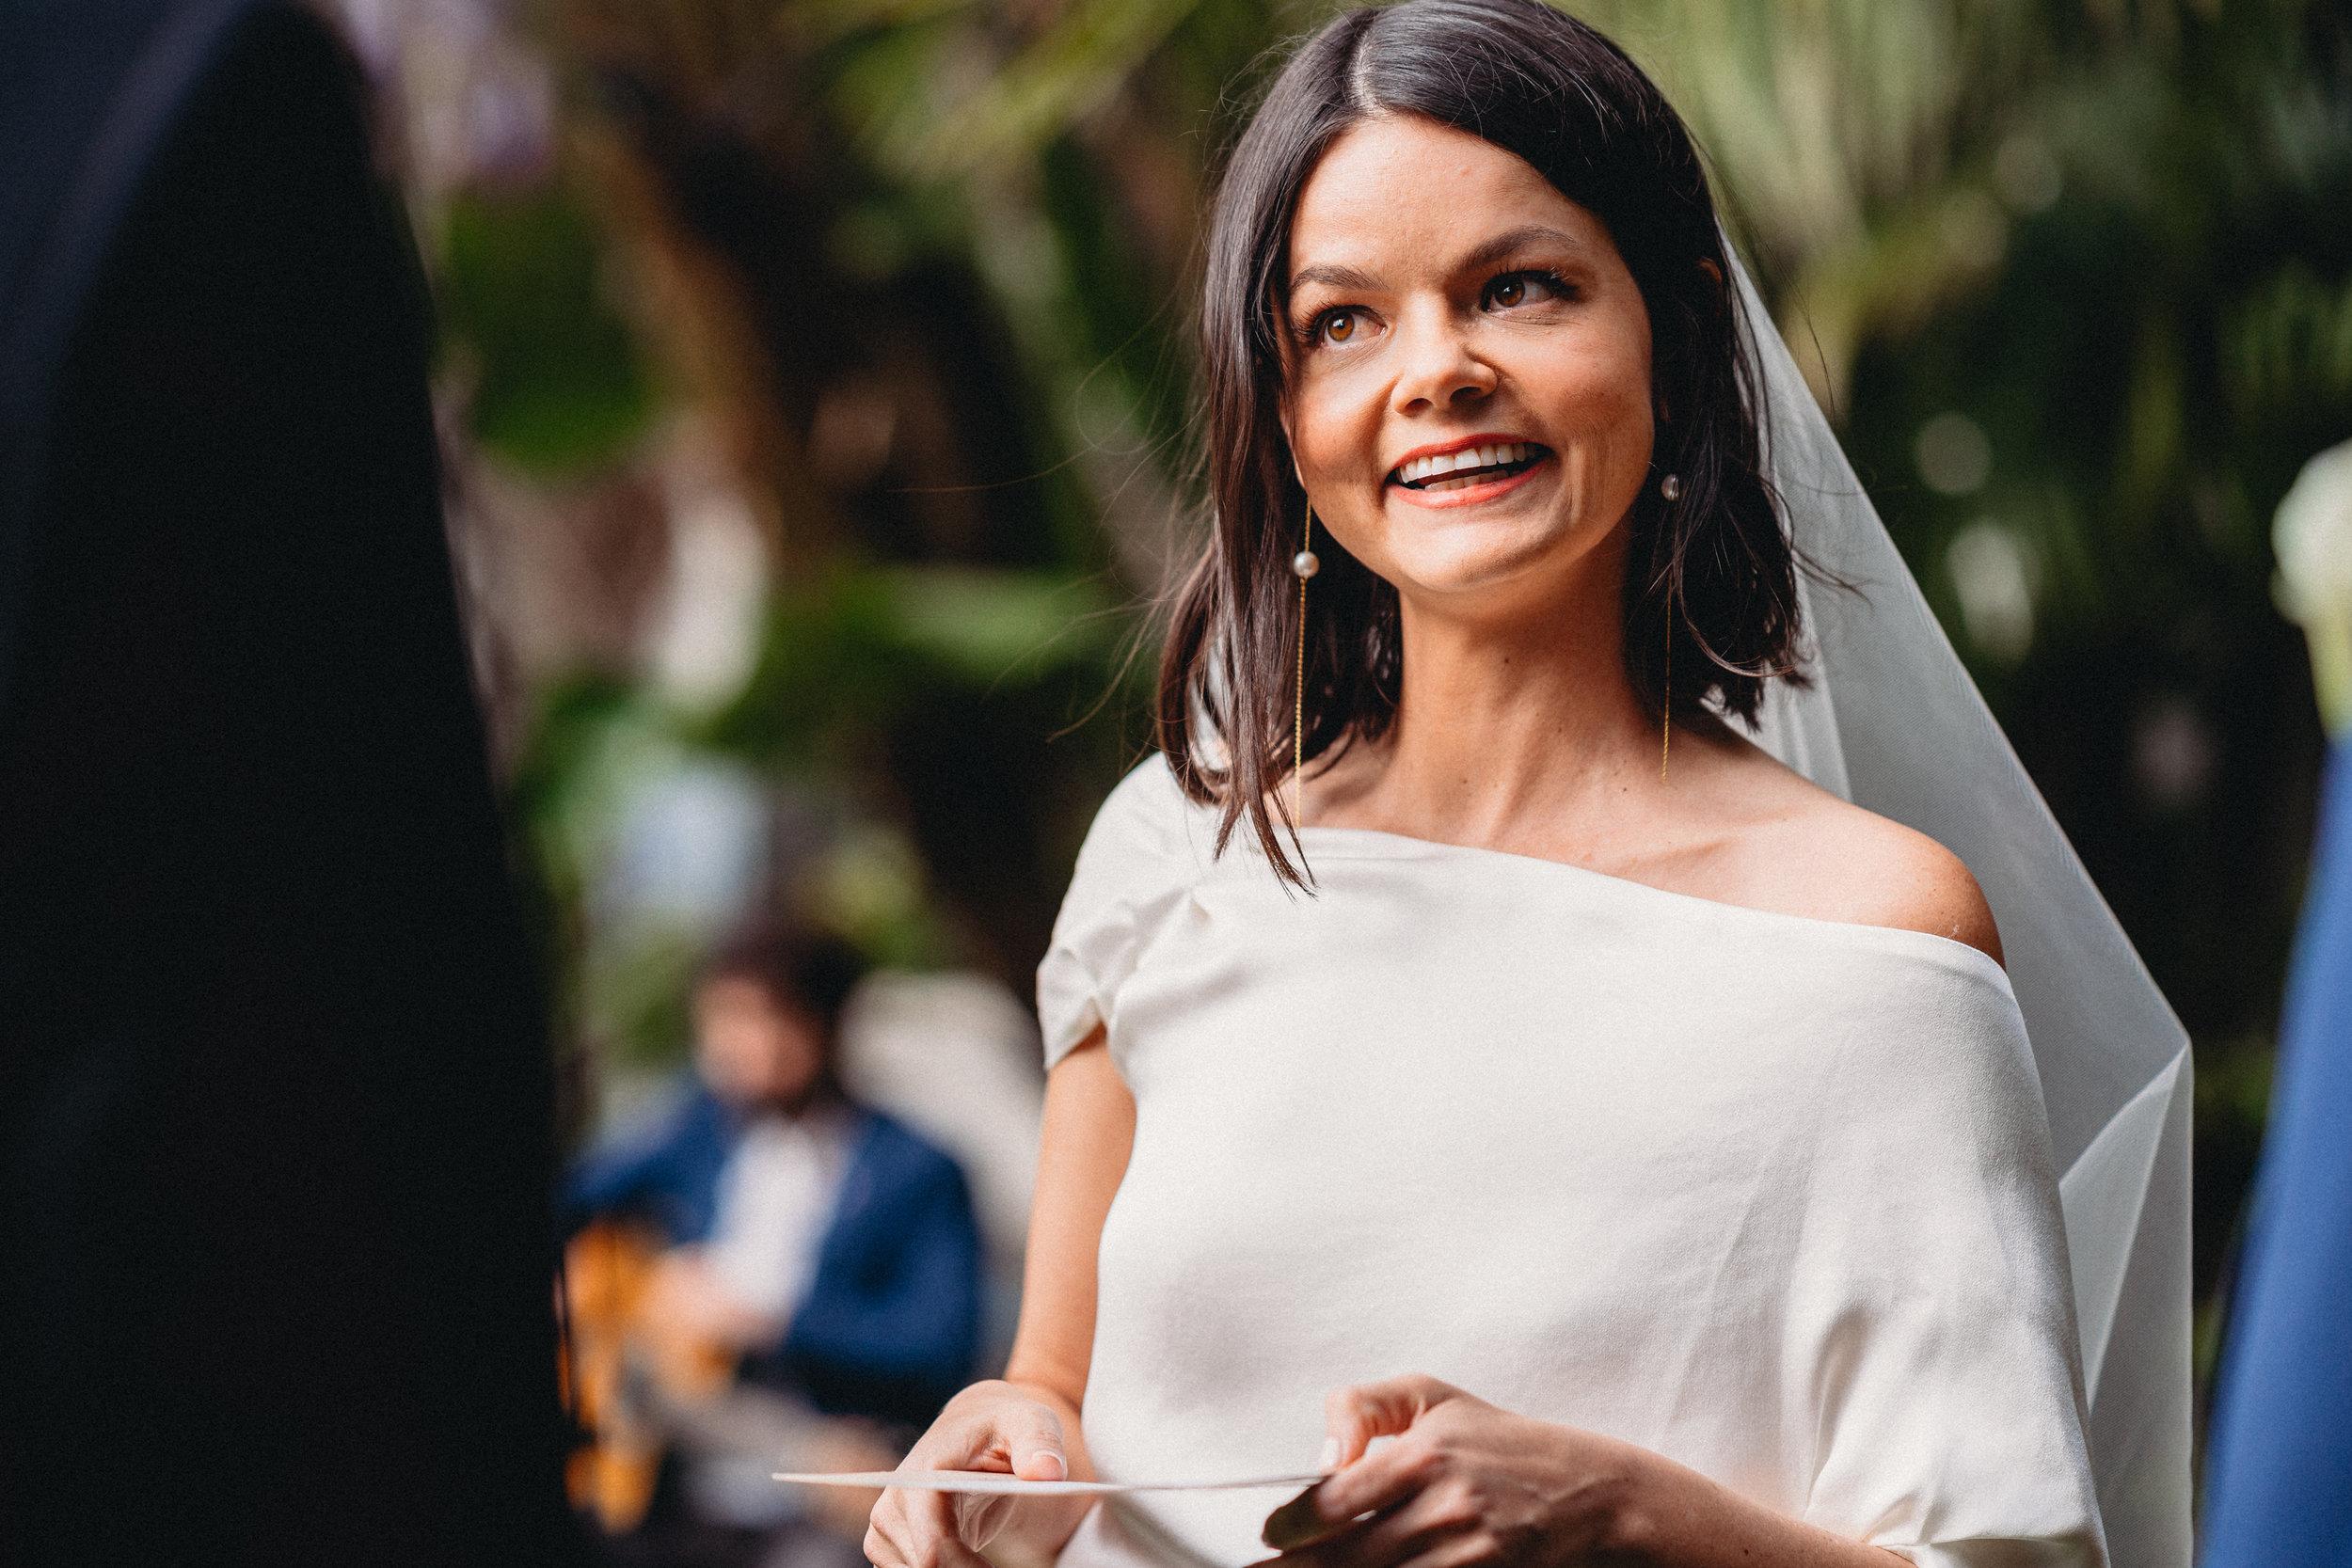 wedding-photography-santa-barbara-courthouse-rebeccaylasotras-70.jpg